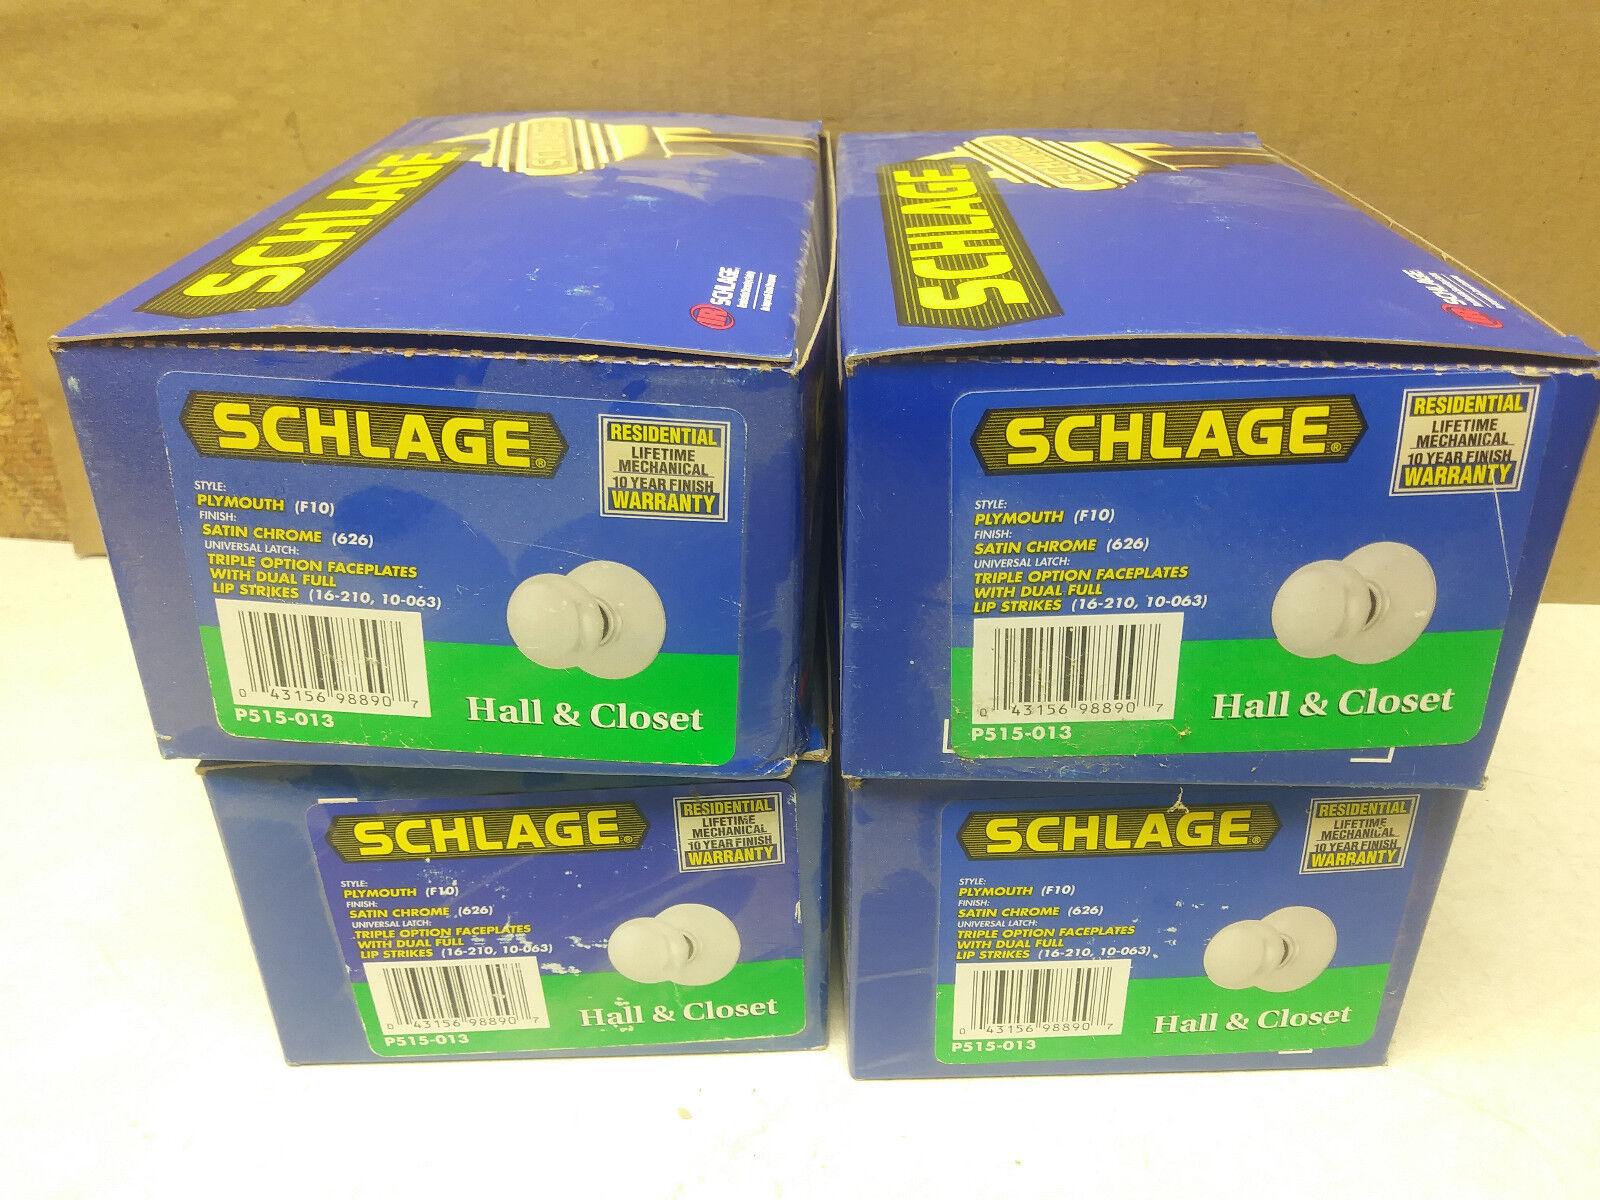 Schlage doorknobs (4) Hall & Closet/Passage, 'Plymouth' F10 Satin Chrome 626